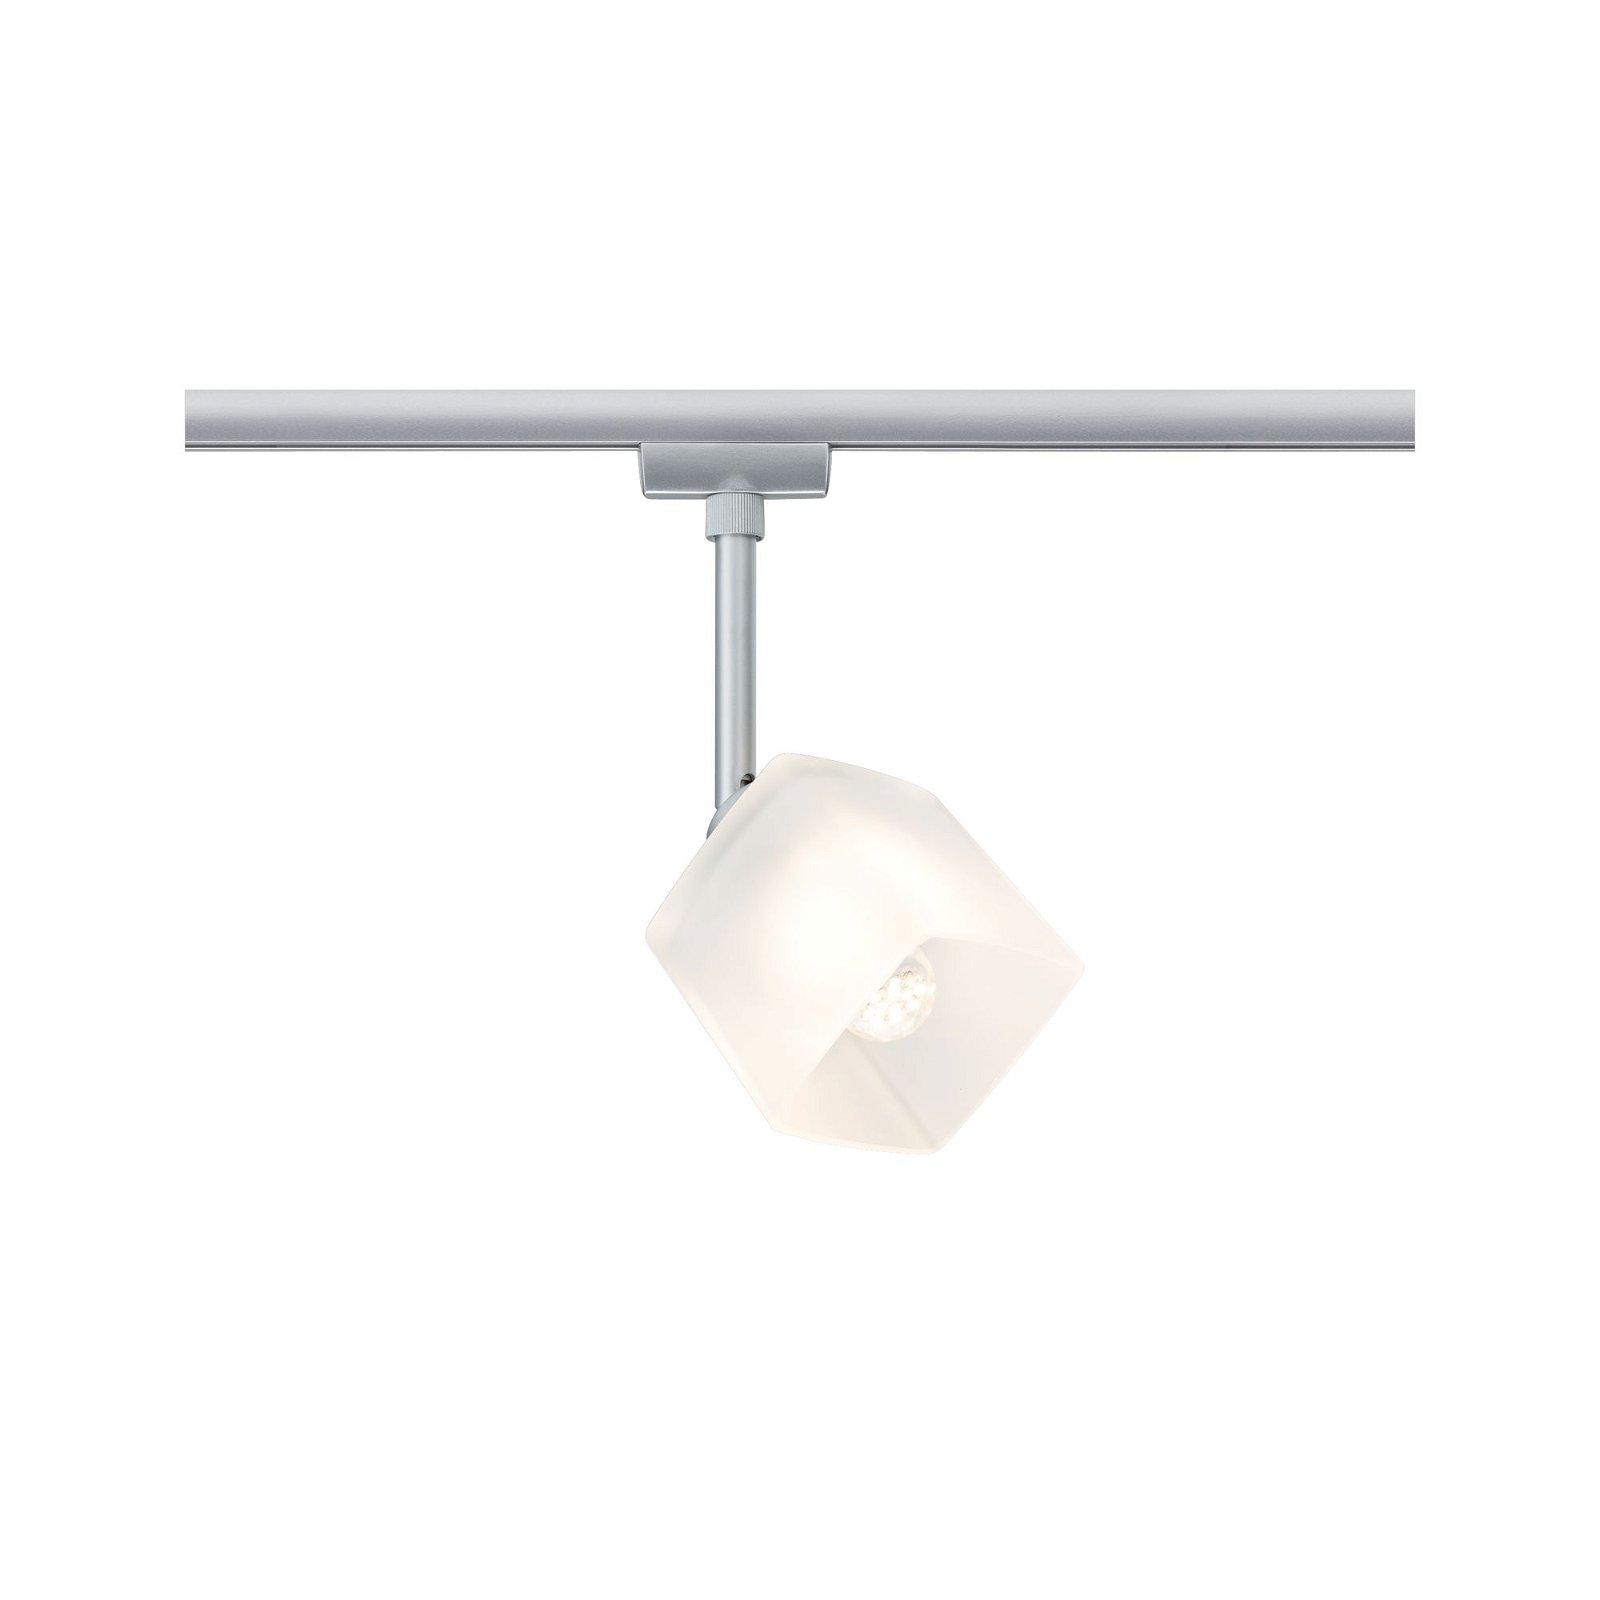 URail, LED-Spot, 3W, Quad 230V, Chrom matt / Weiß